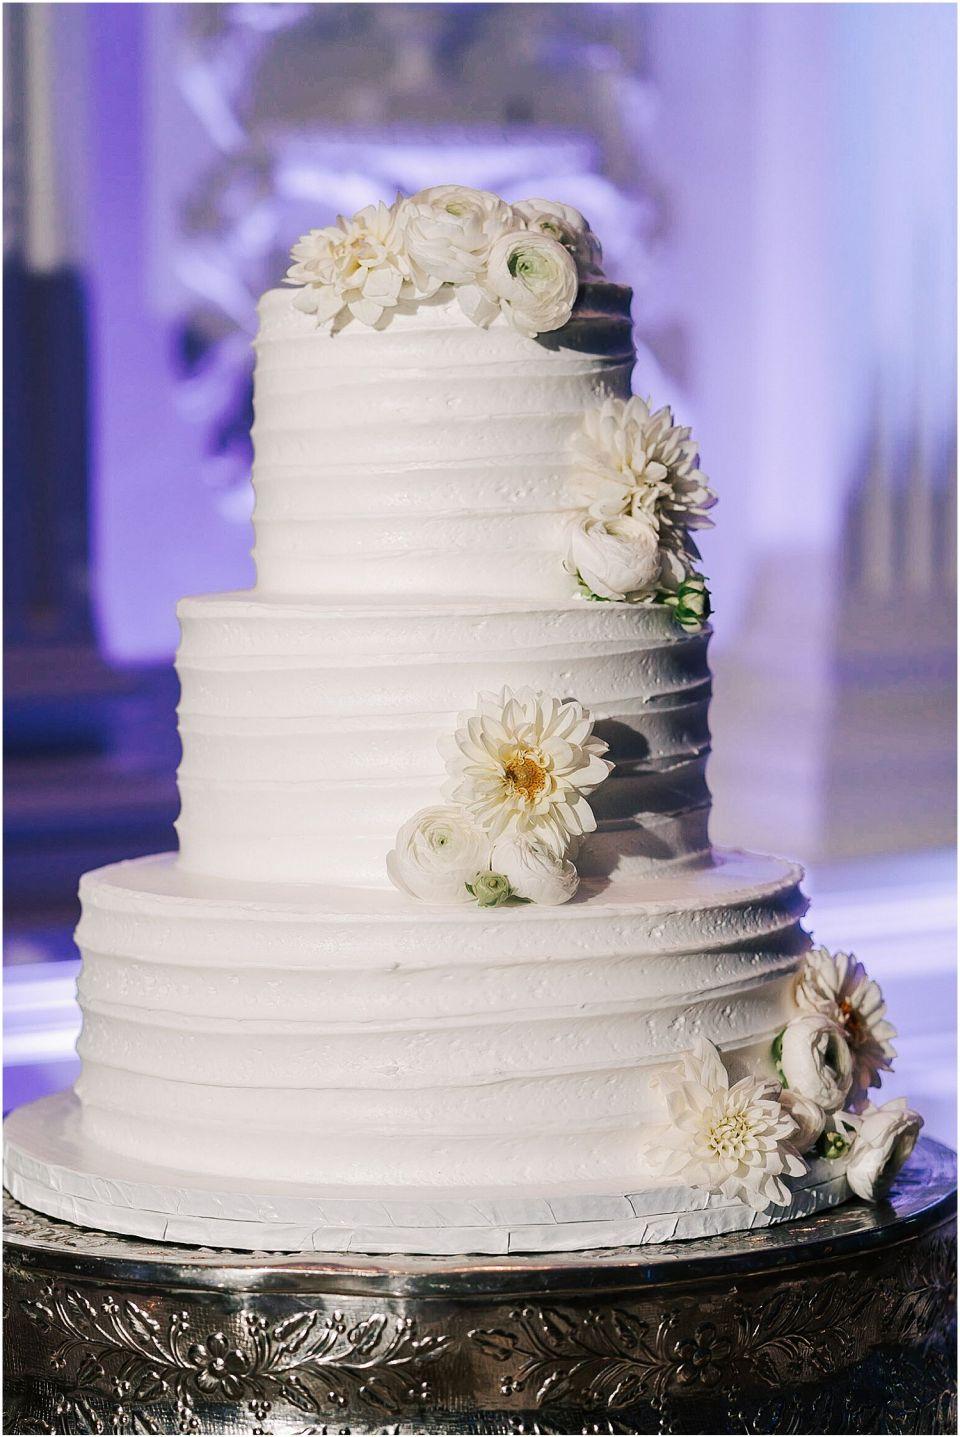 beautiful cake shot at the Valley Regency Wedding